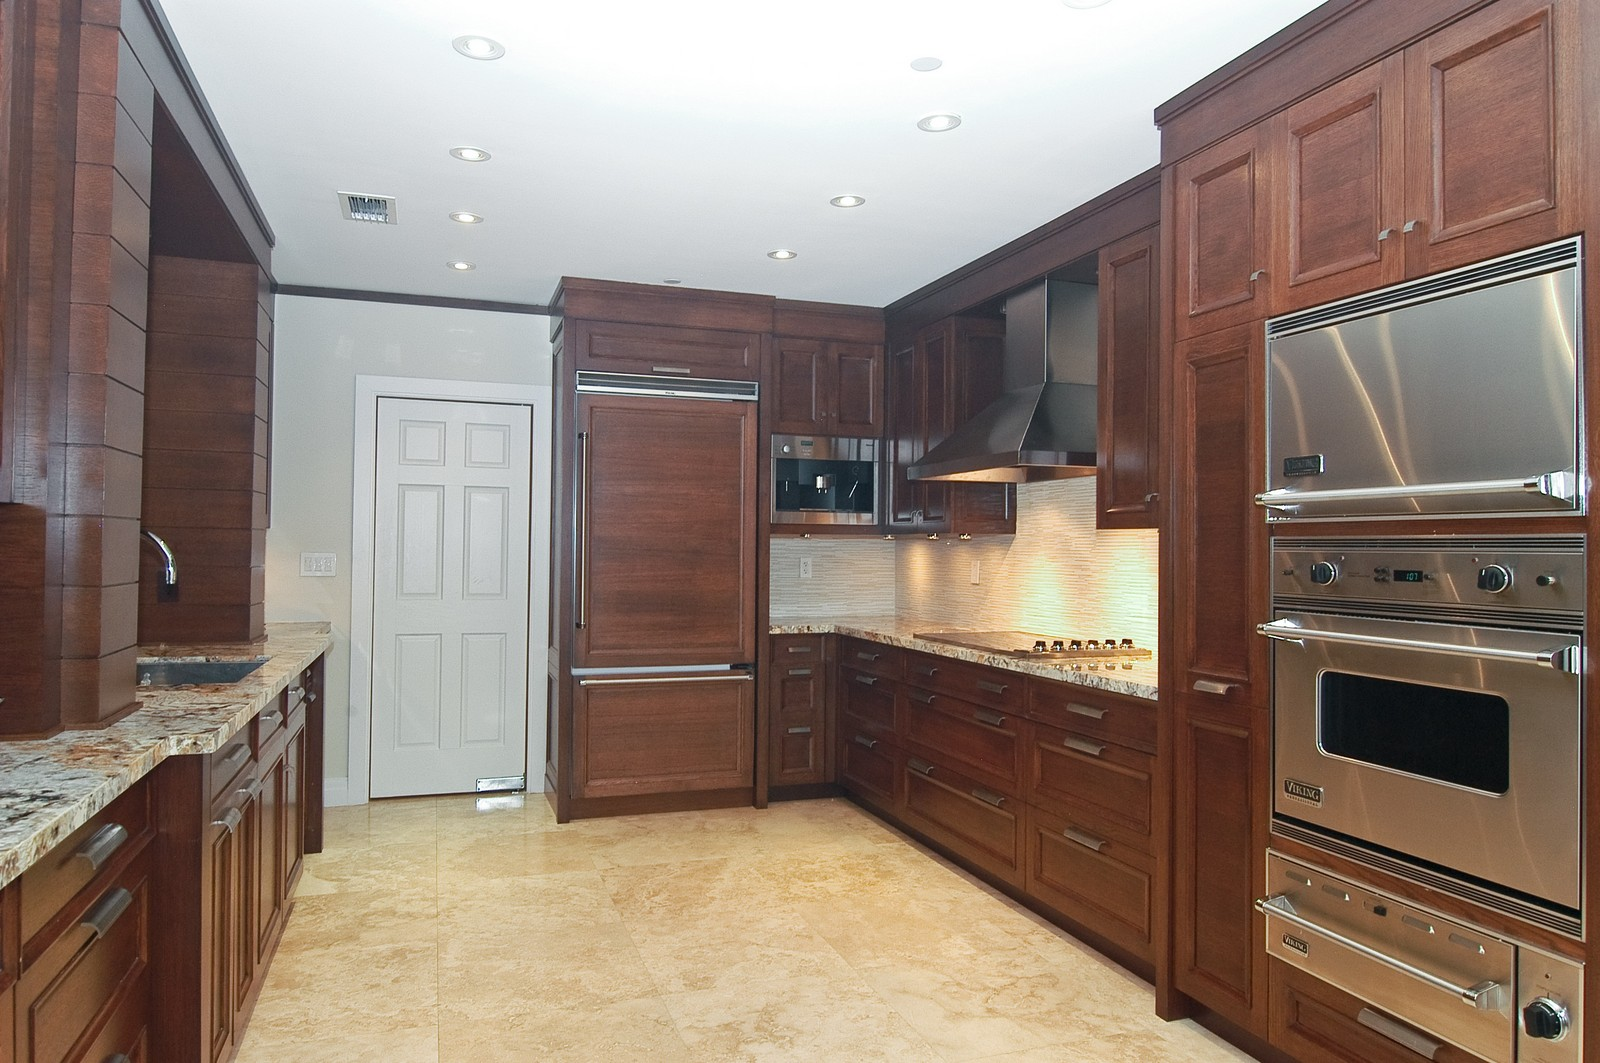 Real Estate Photography - 2331 Fish Island Dr, Fisher Island, FL, 33109 - Kitchen